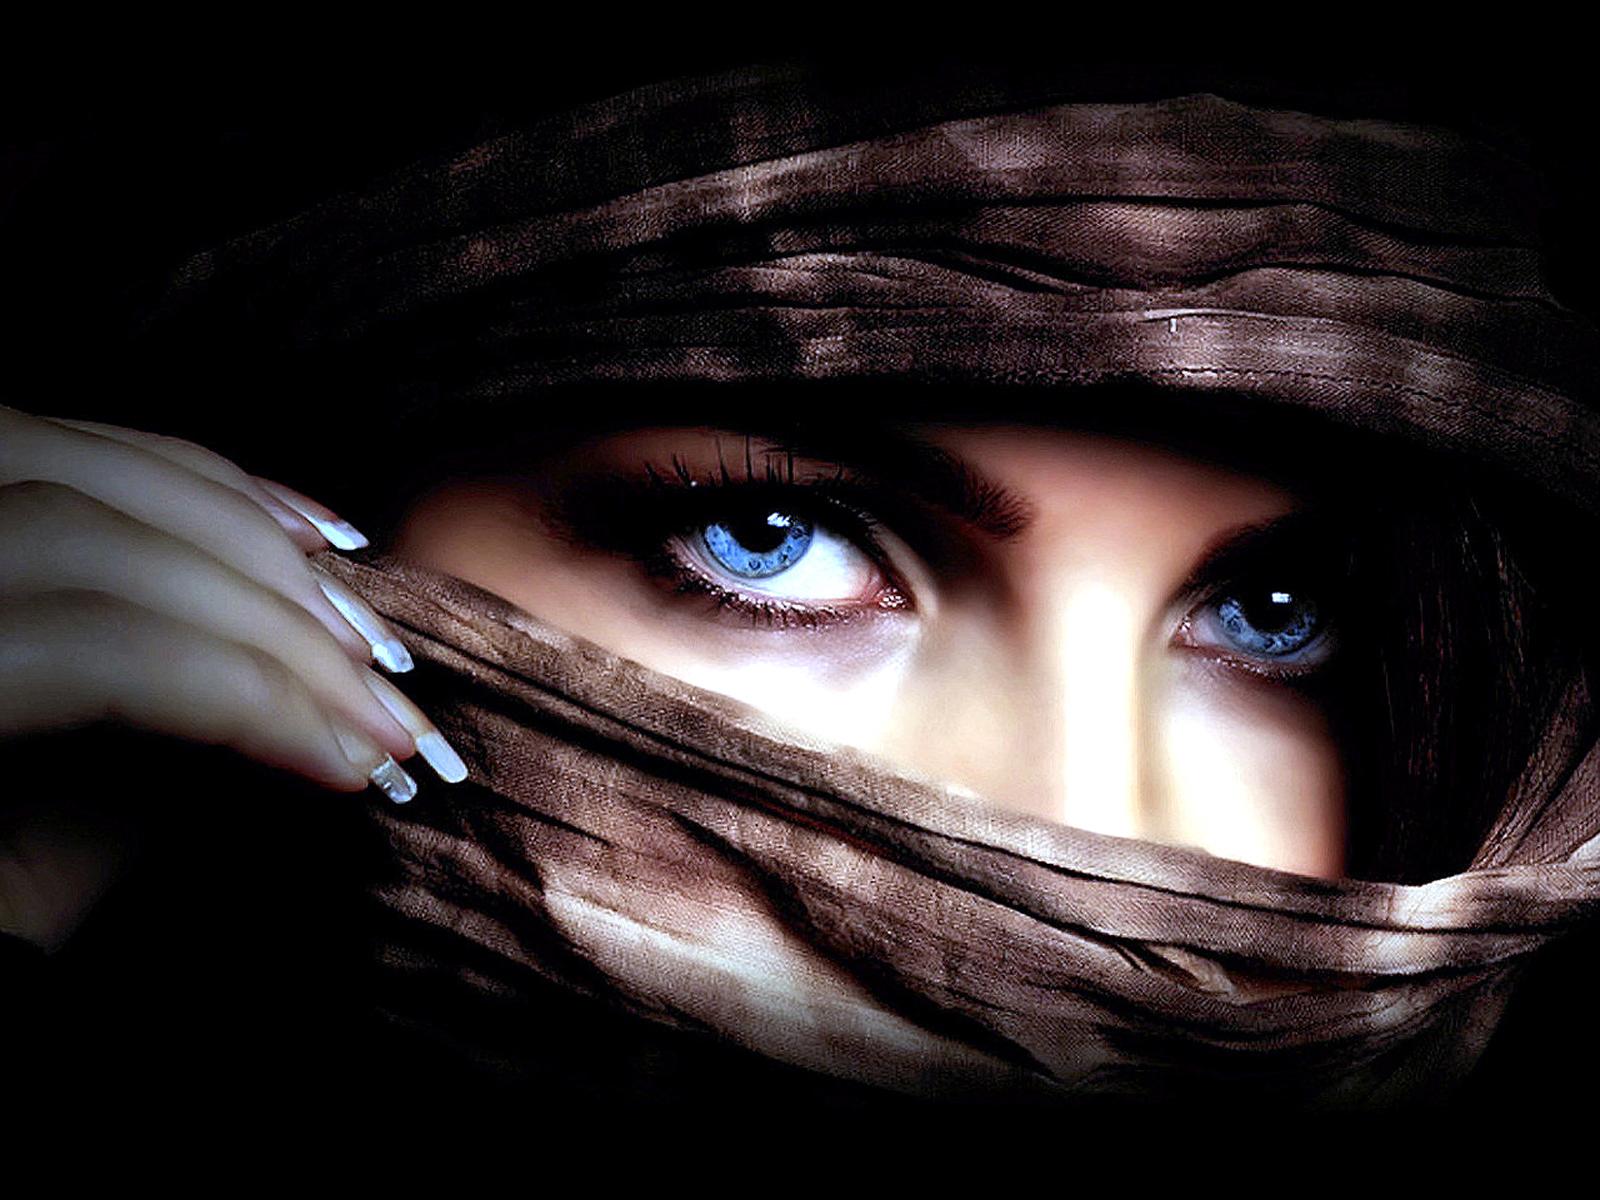 Donne - Occhio  - Blue Eyes Sfondi